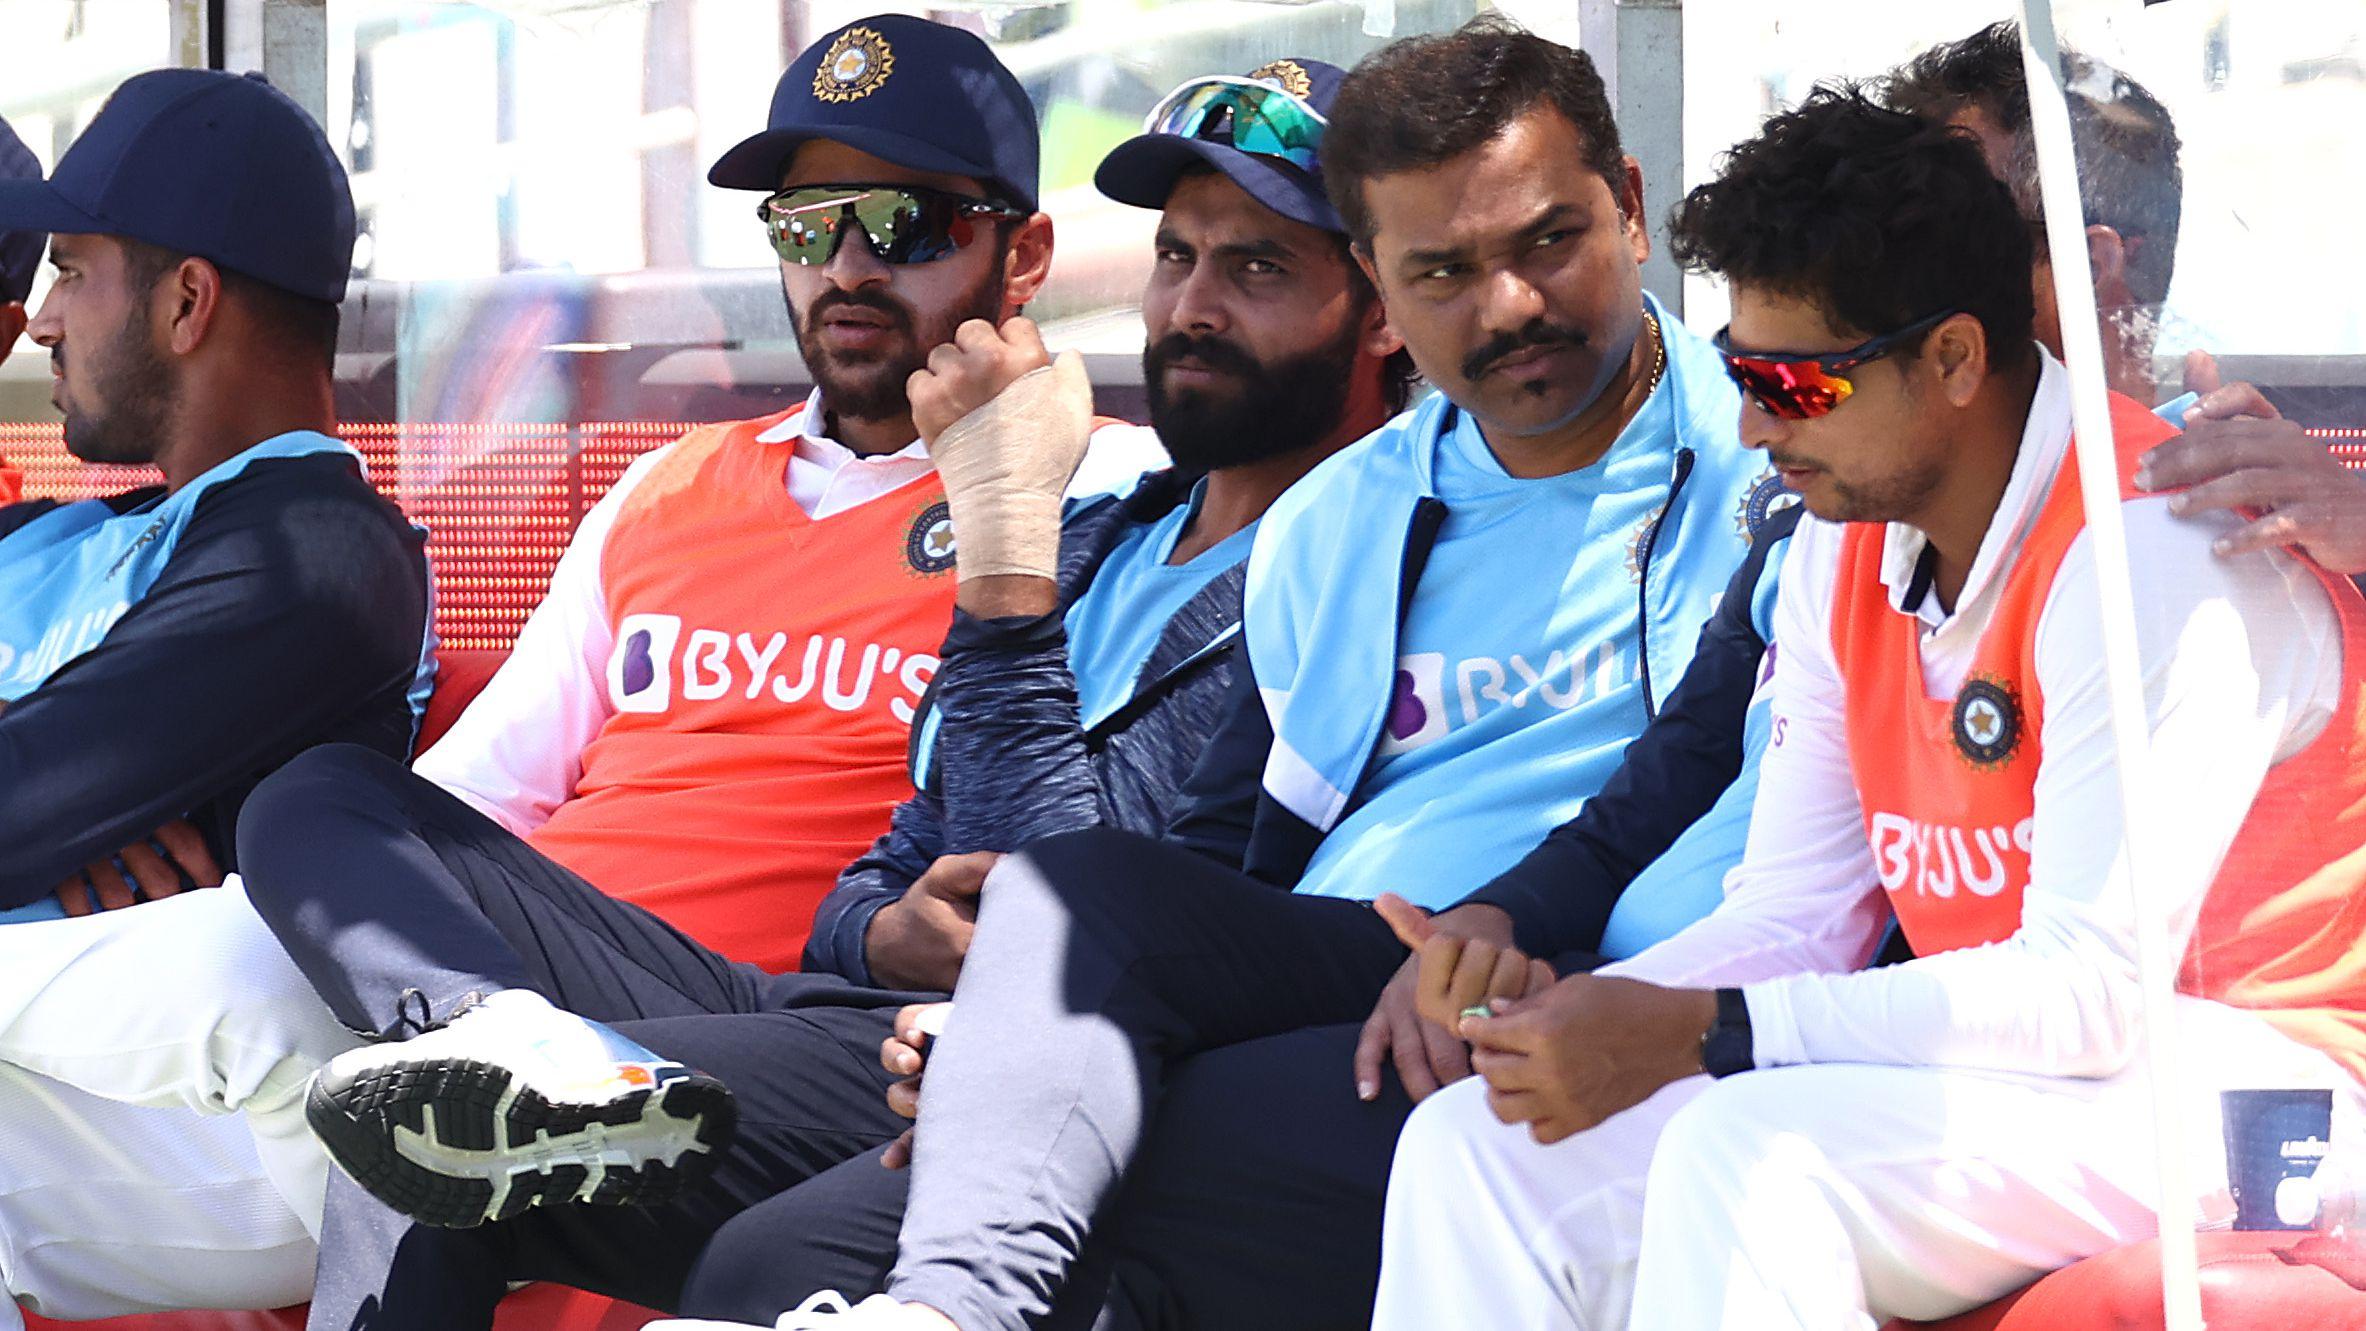 EXCLUSIVE: Ravi Jadeja absence, Gabba history favour Australia, Mark Taylor says